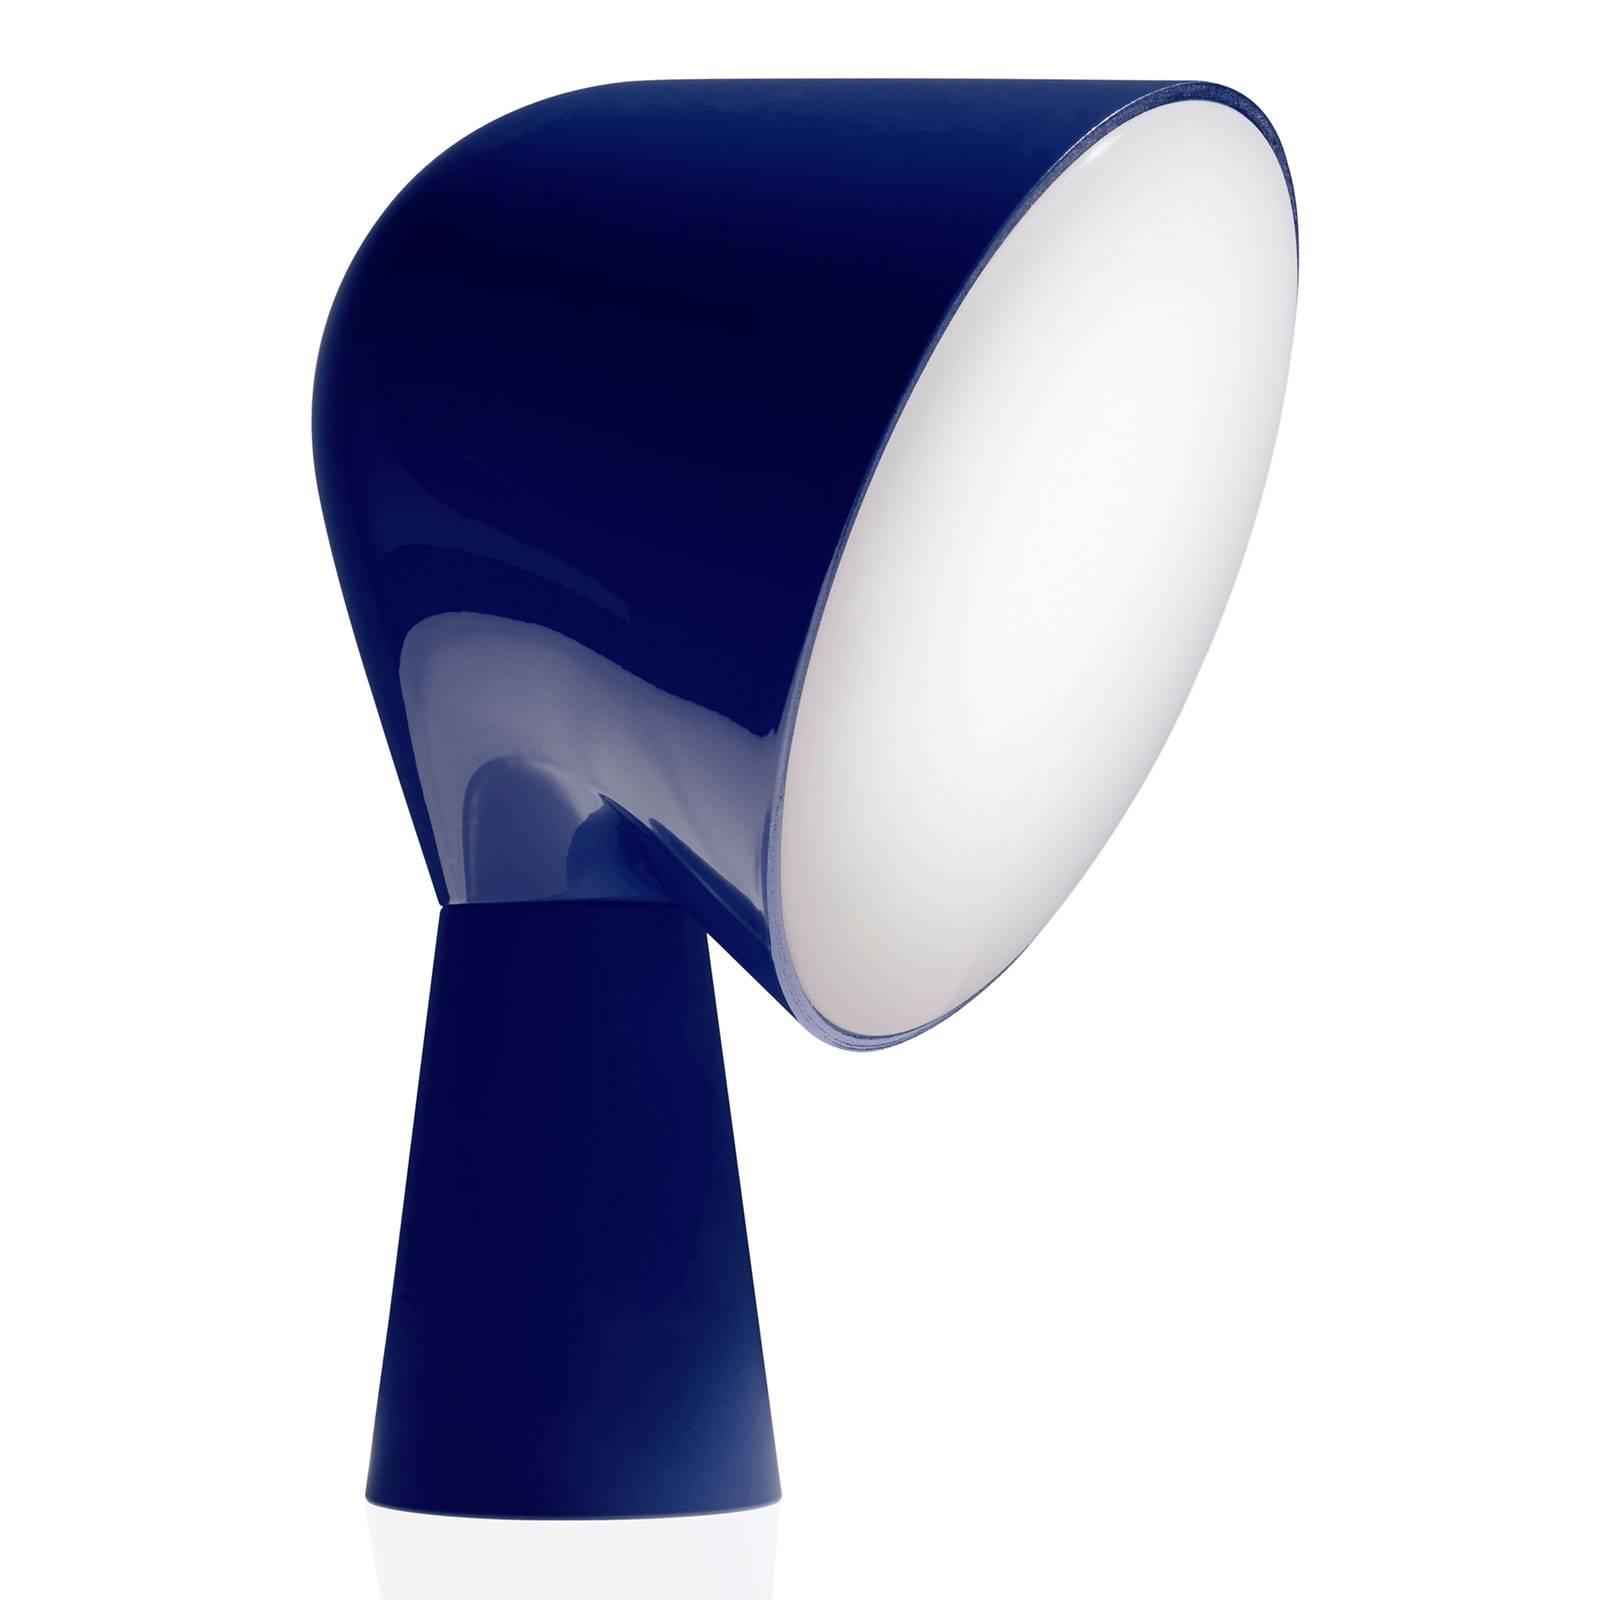 Foscarini Binic Designer-Tischleuchte, blau